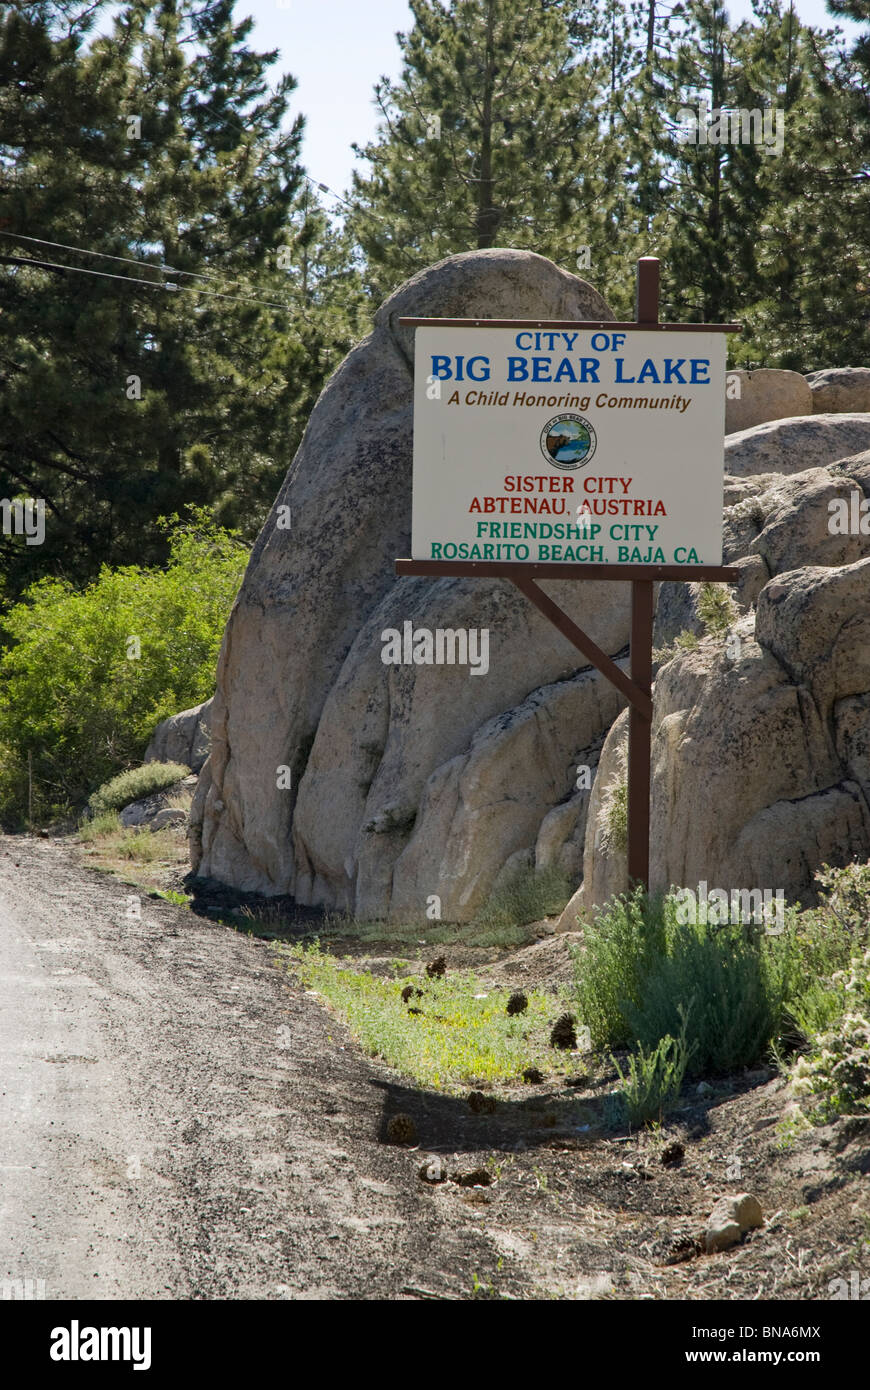 The sign that marks the city limits at Big Bear Lake, California, USA - Stock Image